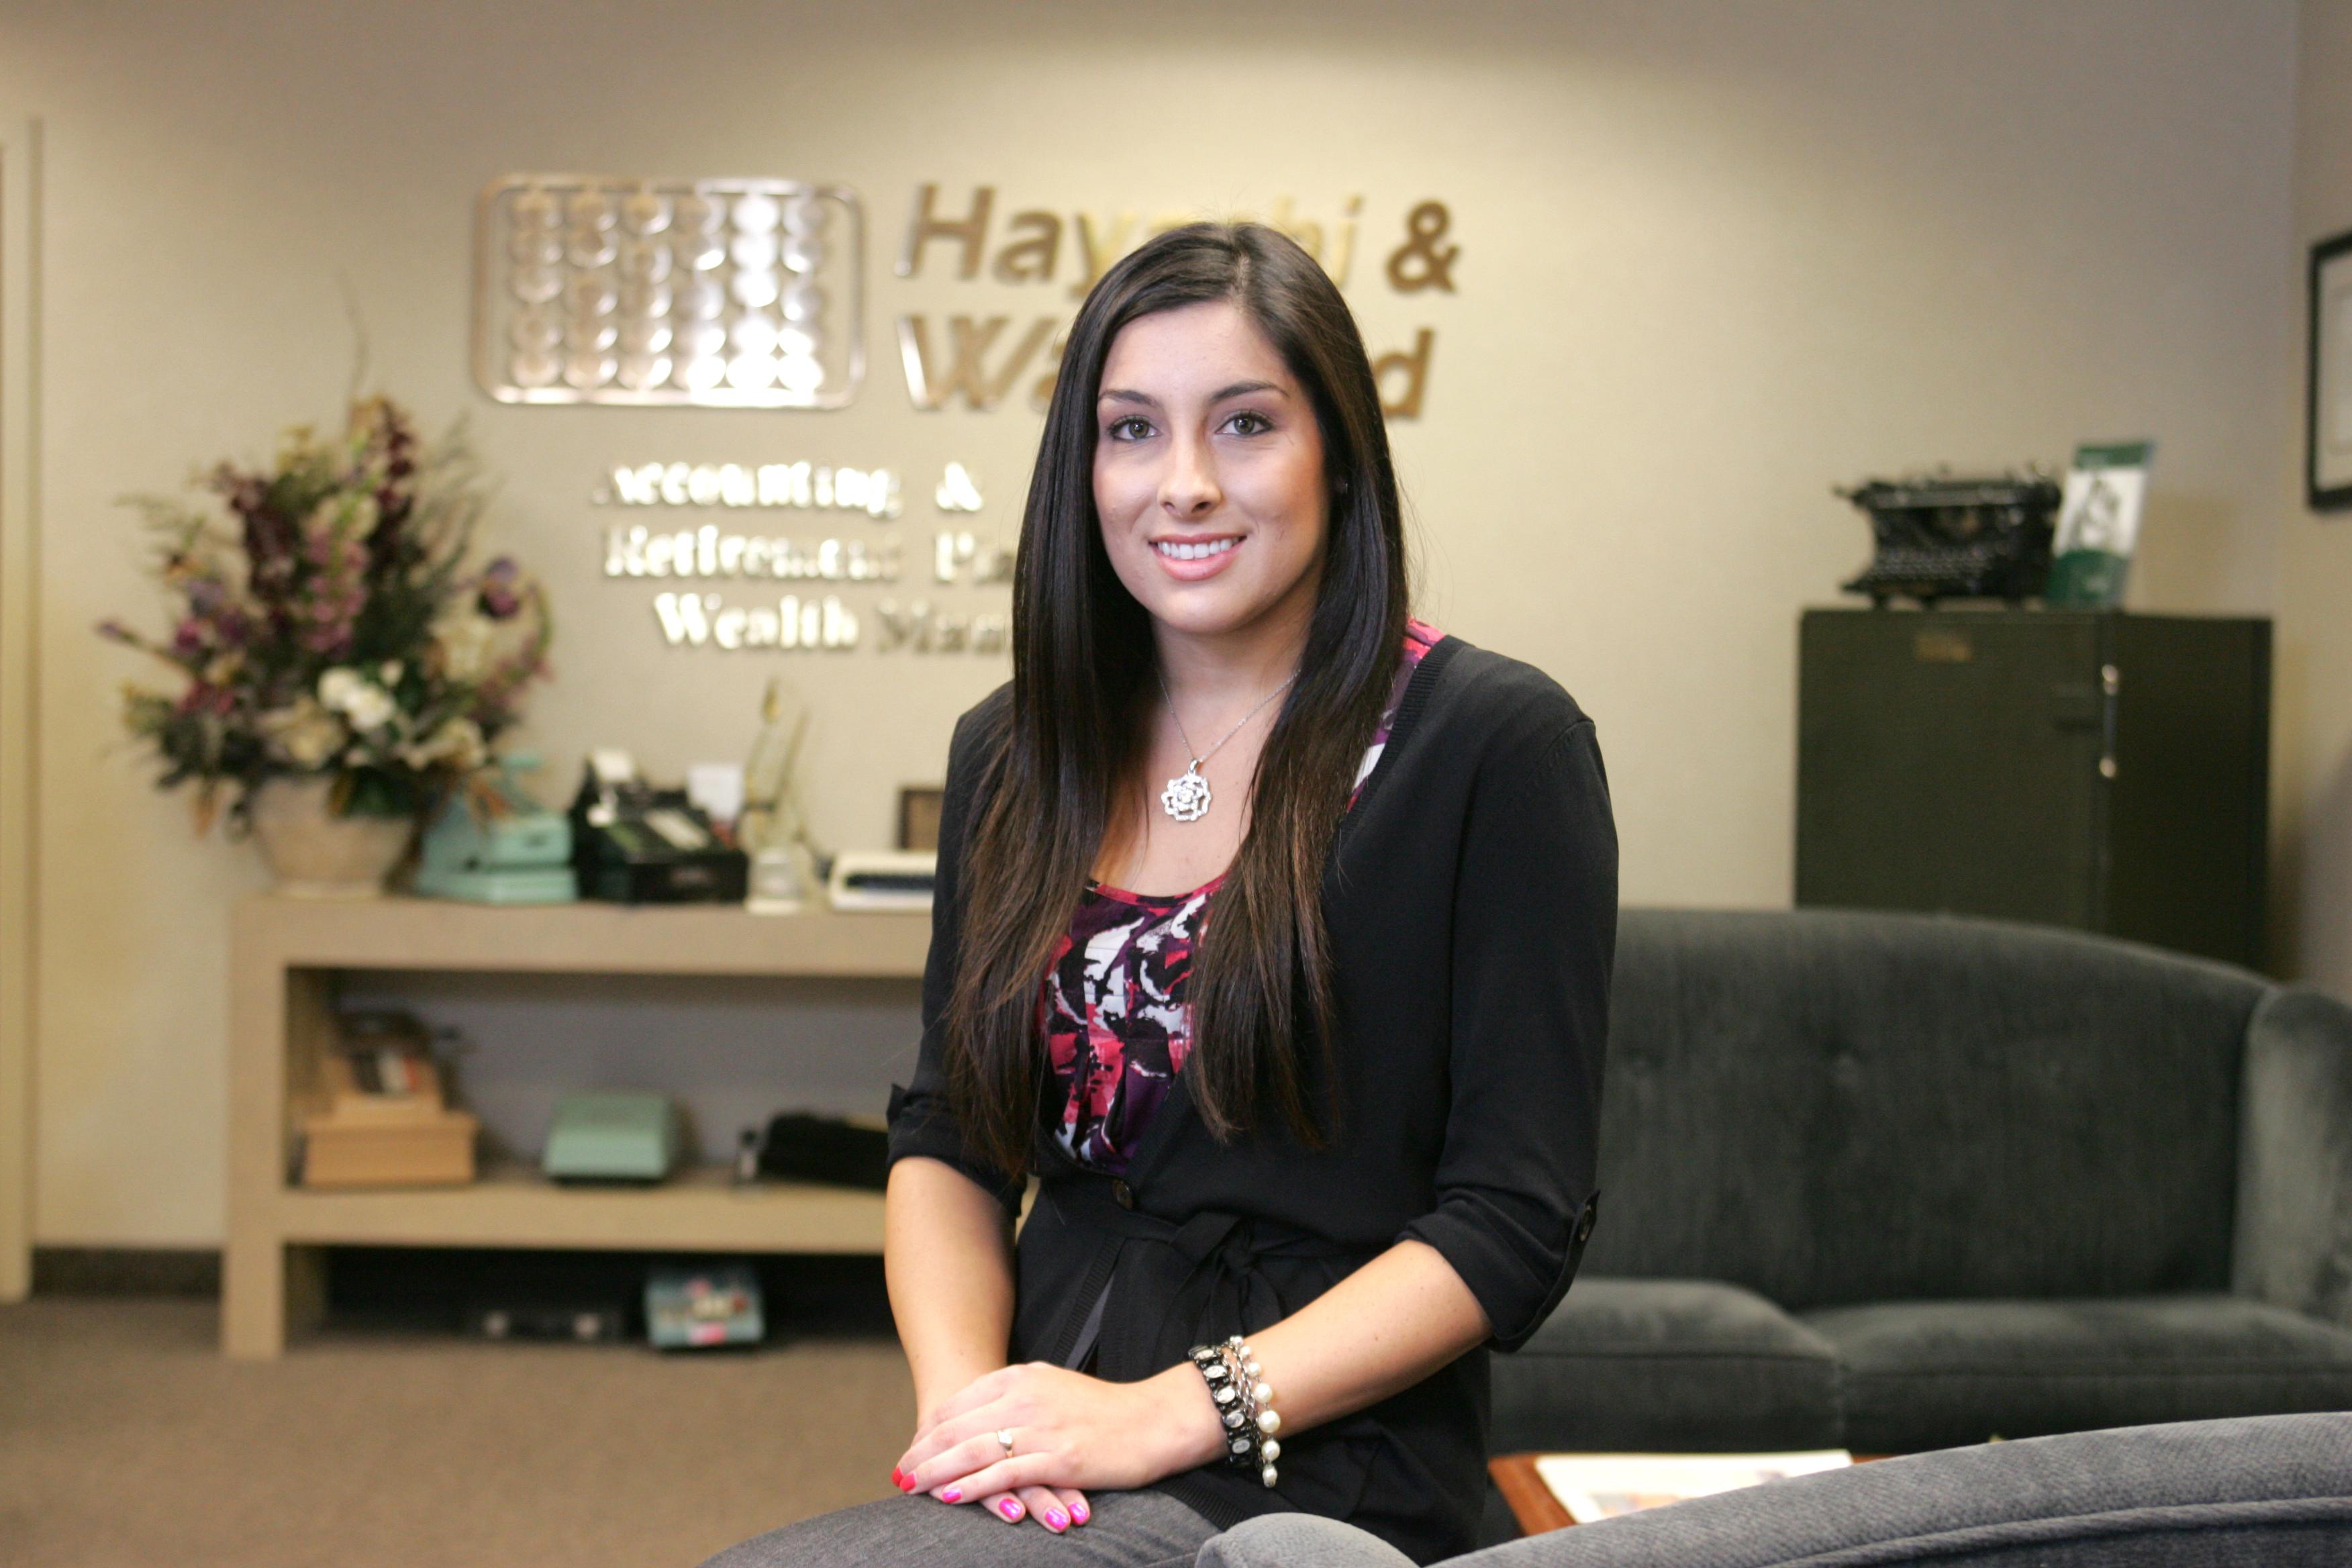 Jessica Grado, graduate, Career with Hayashi & Wayland.